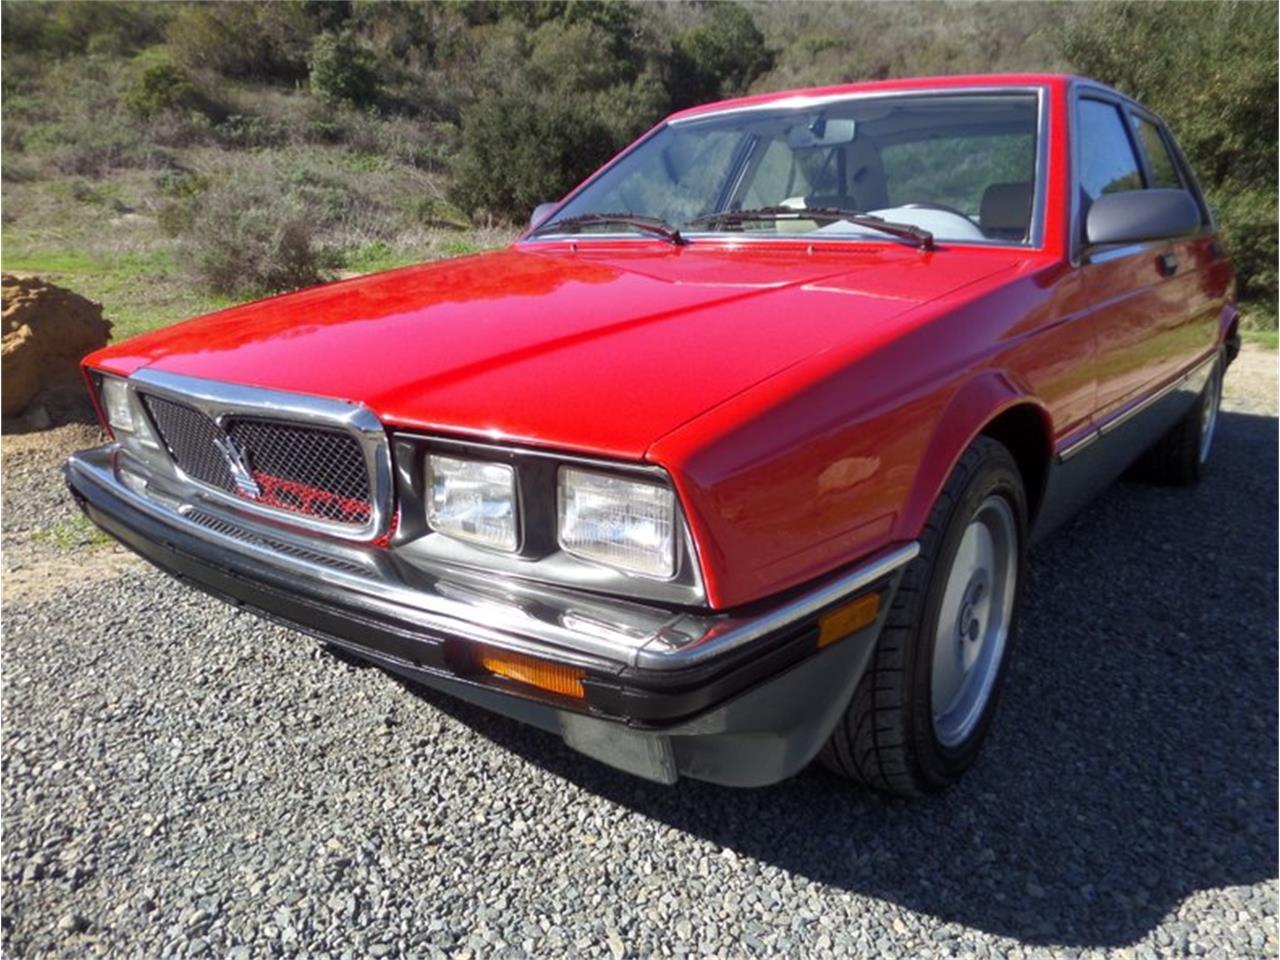 1989 Maserati Biturbo for Sale   ClassicCars.com   CC-1180047